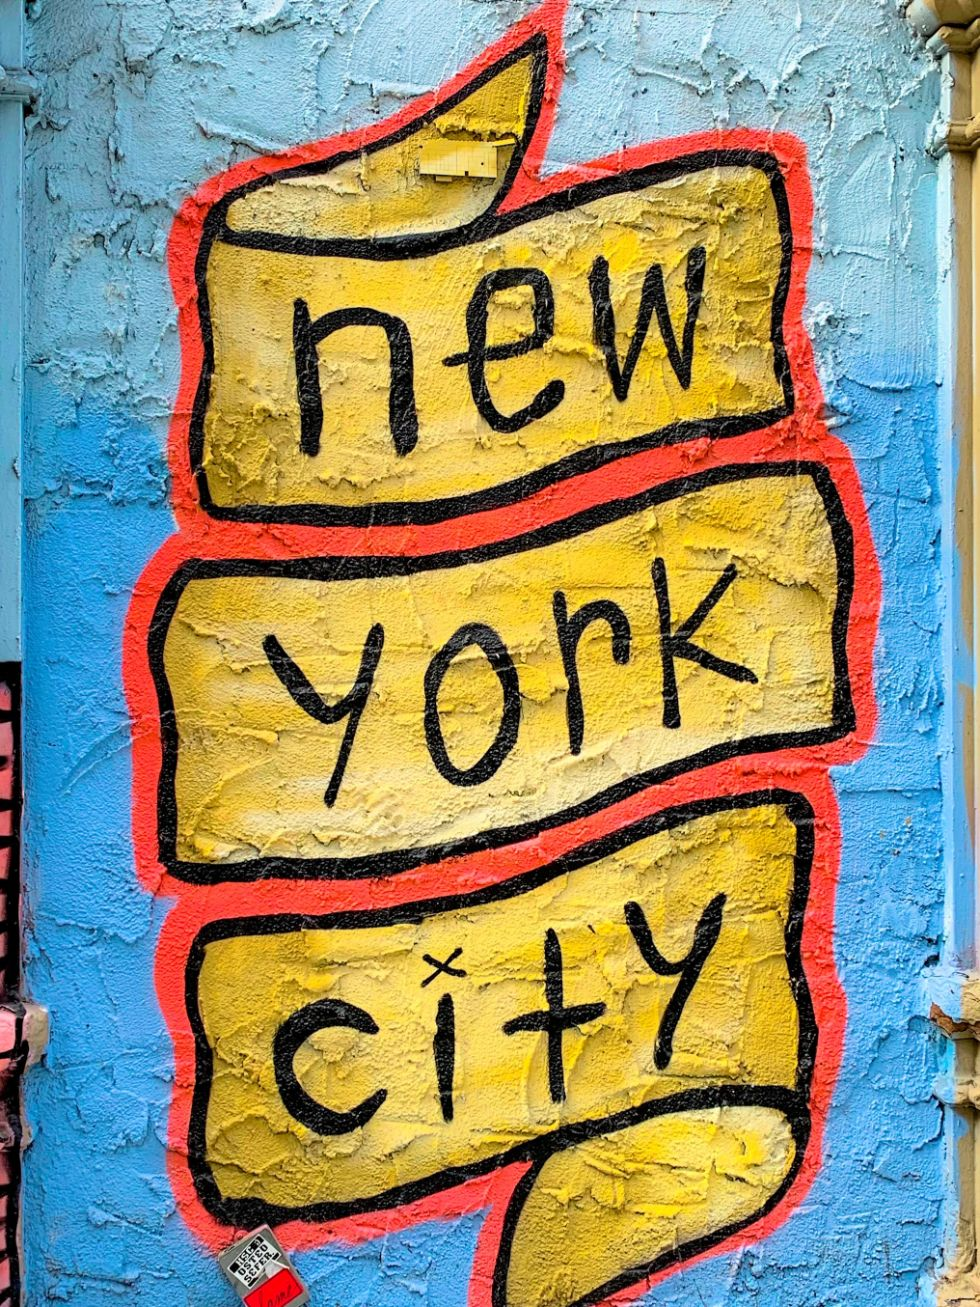 Yellow and blue 'New York City' street art